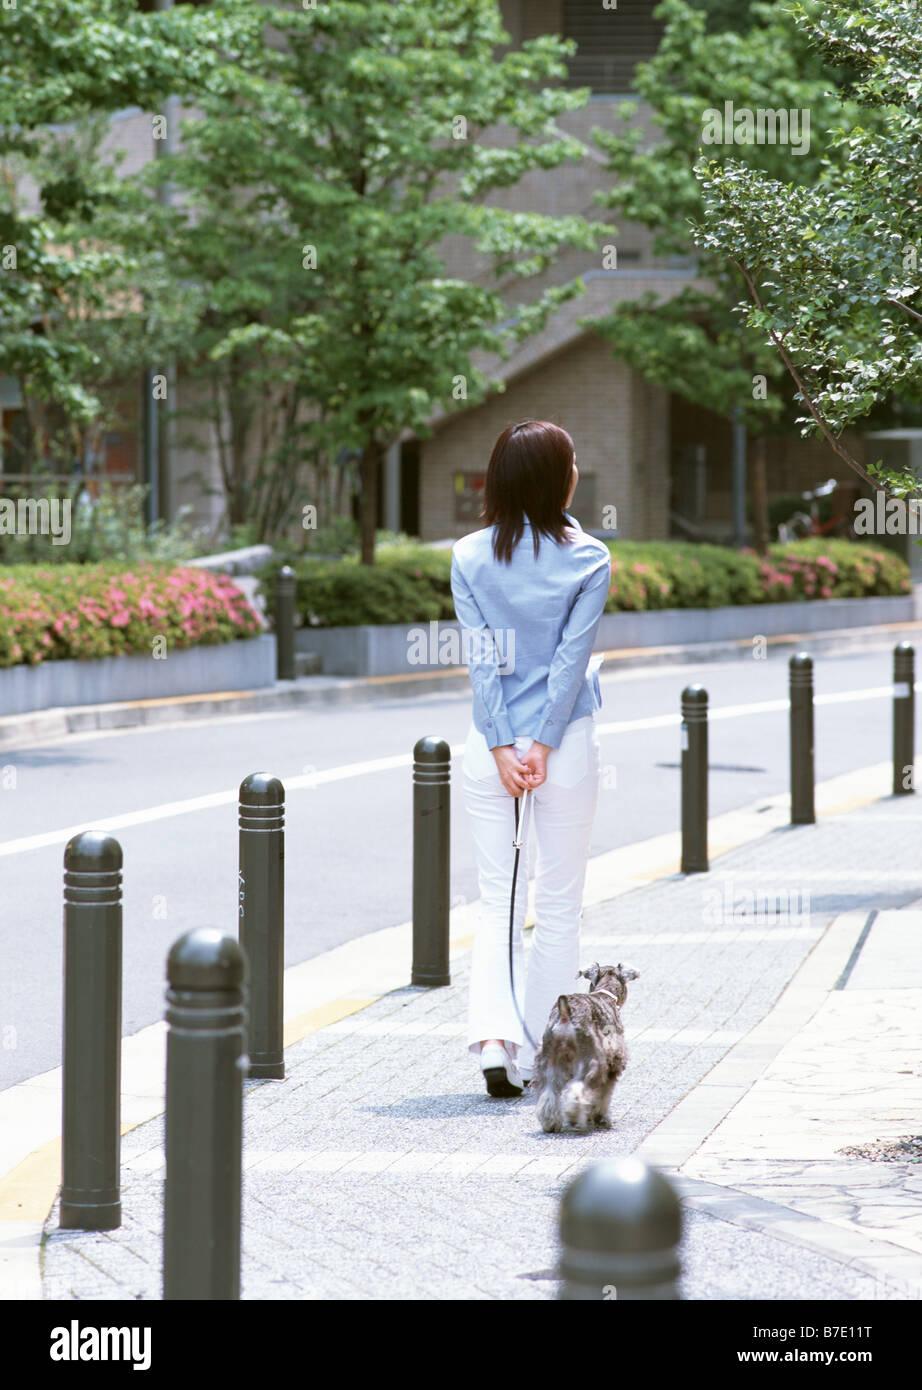 Woman taking dog for walk - Stock Image